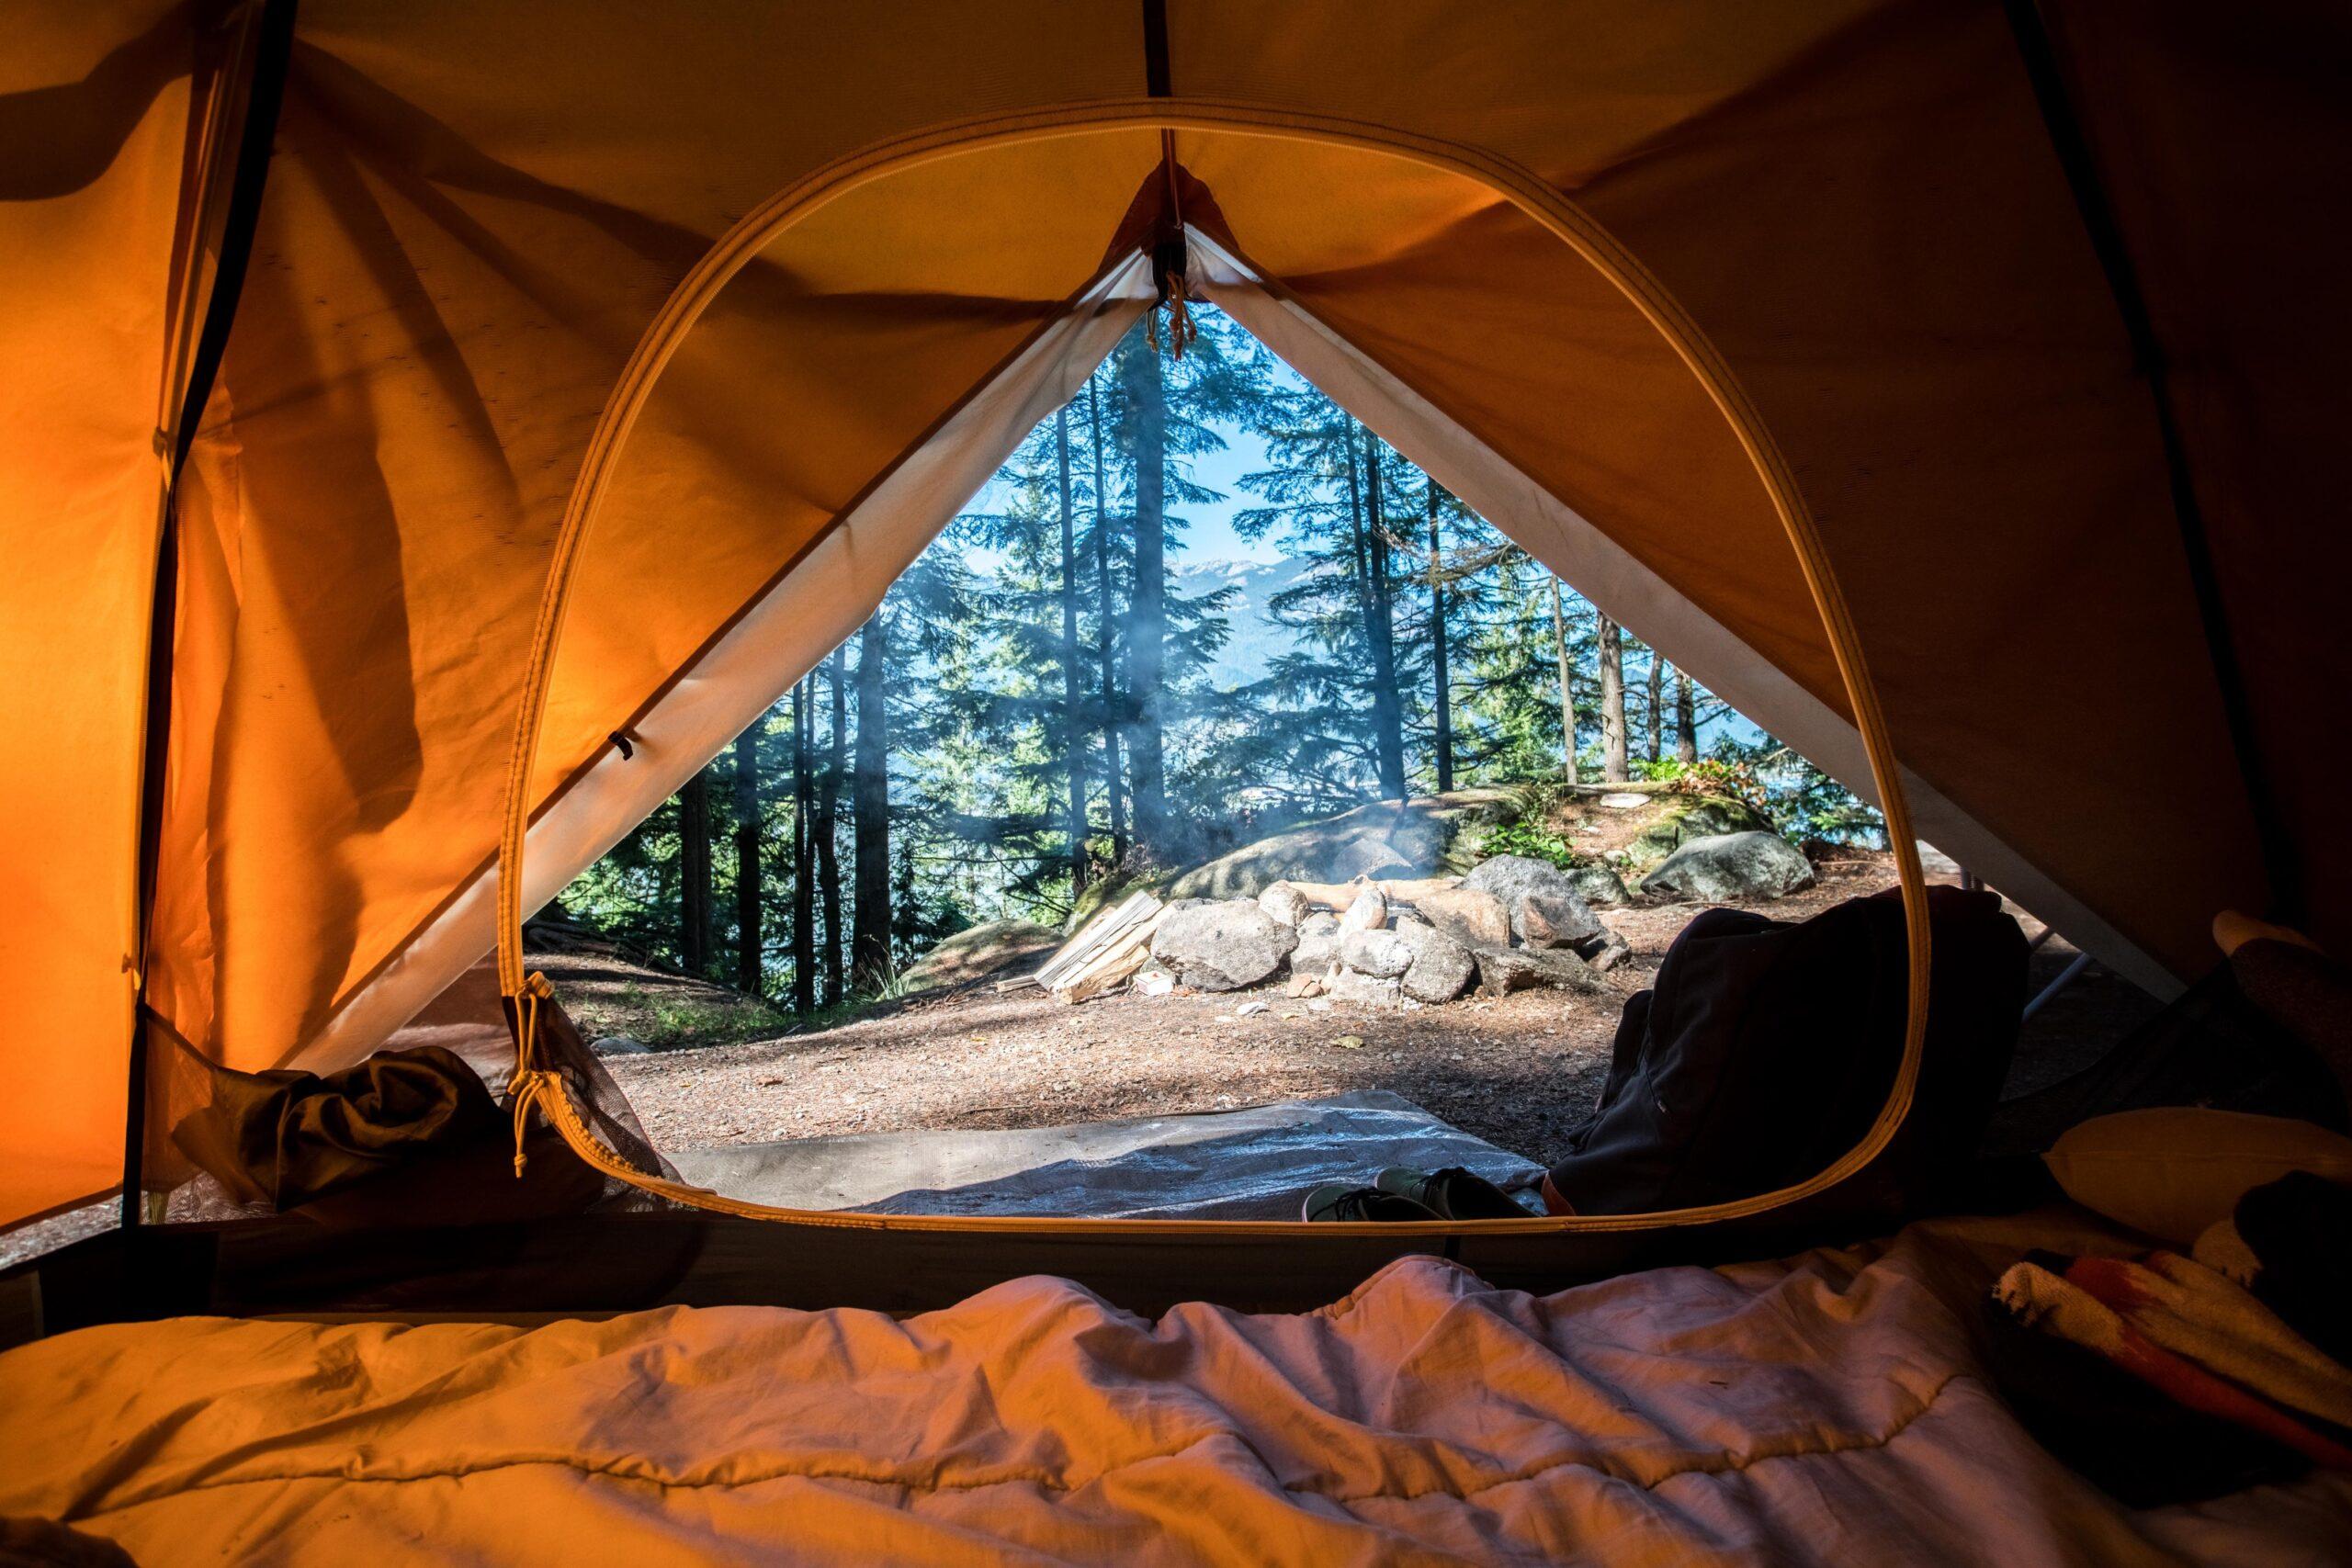 Squamish Valley on the edge of British Columbia